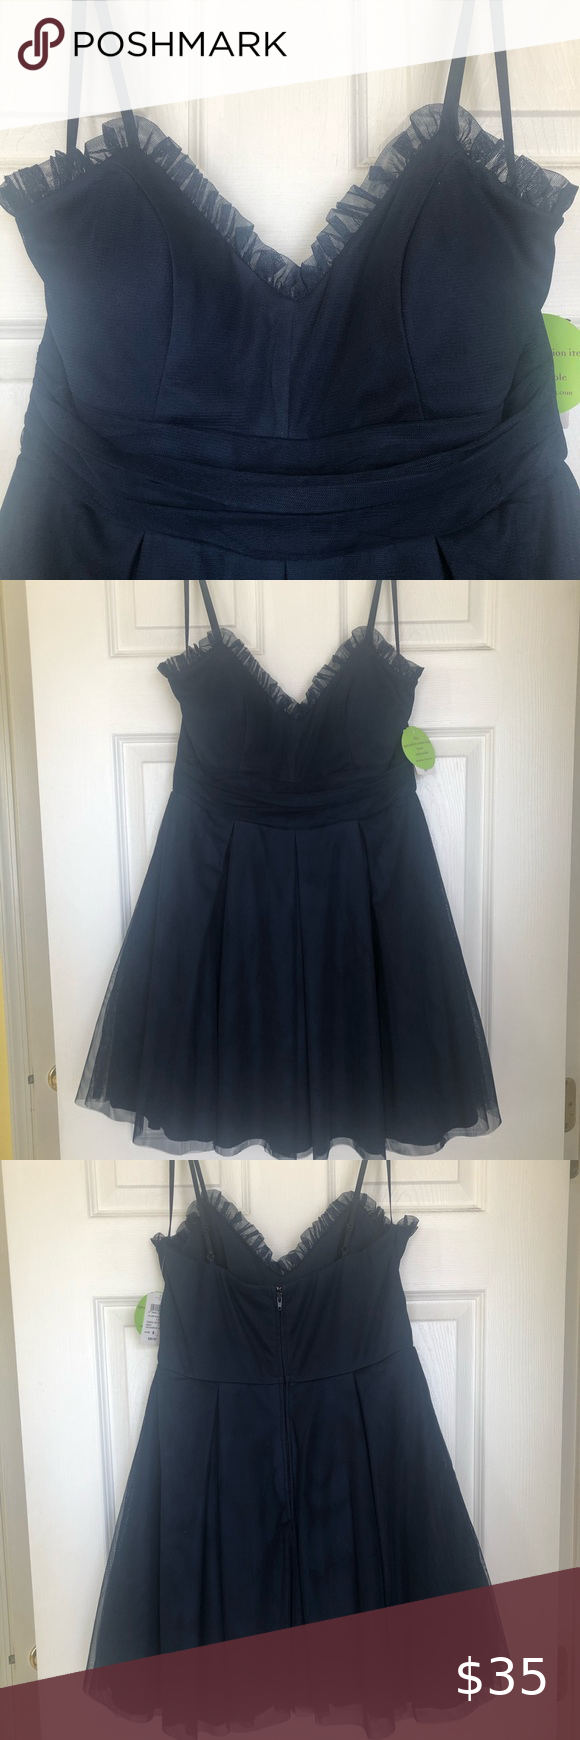 Cute Flirty Dress From Windsor Flirty Dresses Dresses Clothes Design [ 1740 x 580 Pixel ]